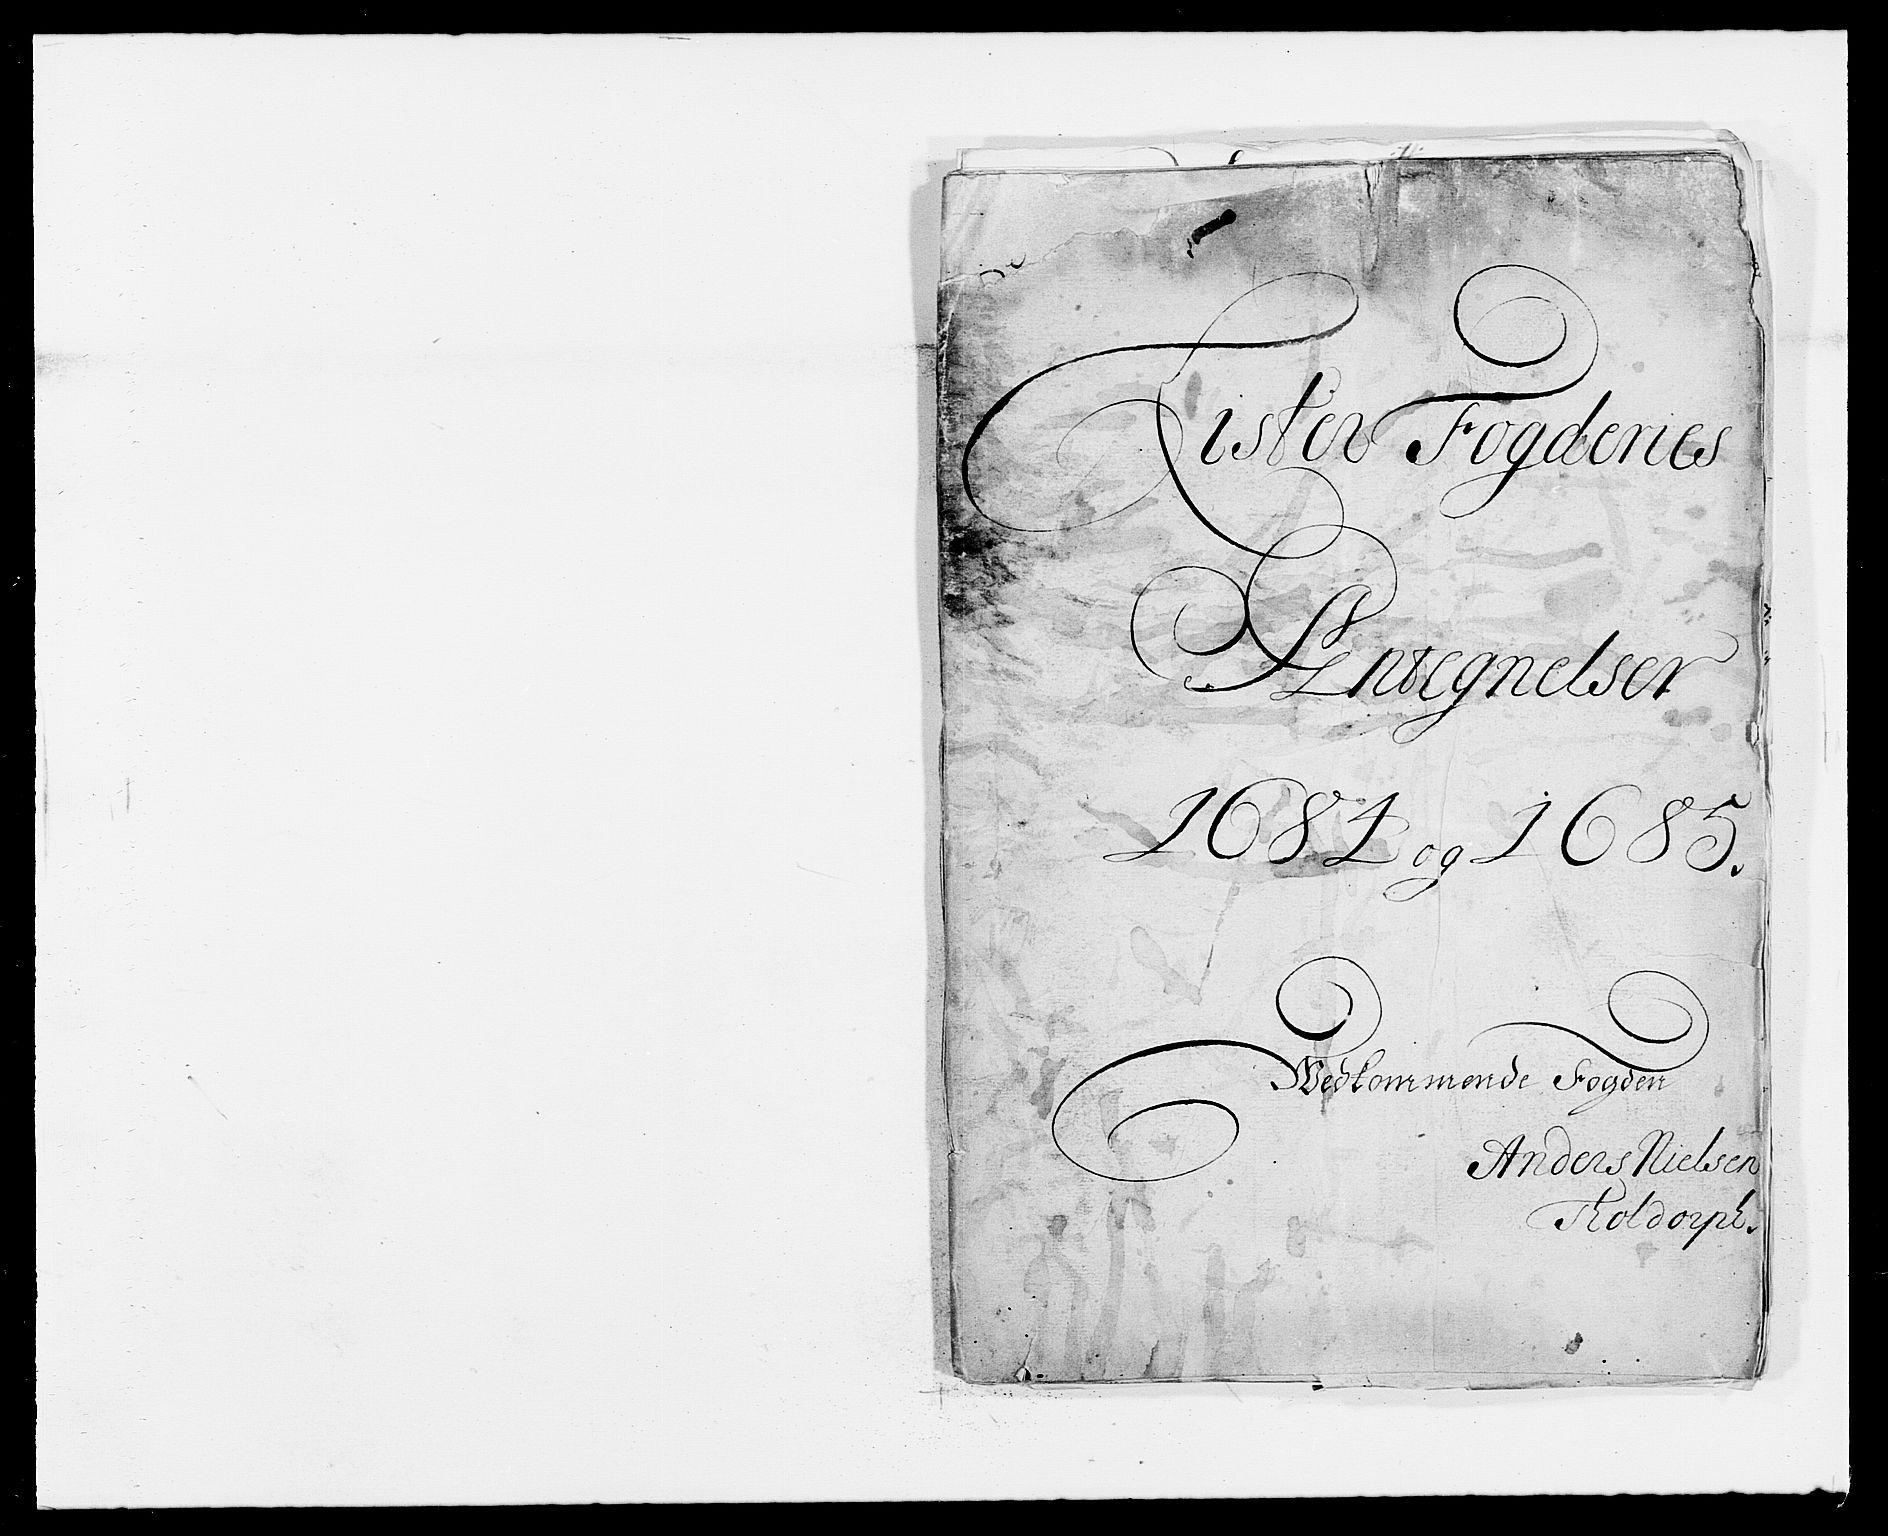 RA, Rentekammeret inntil 1814, Reviderte regnskaper, Fogderegnskap, R41/L2533: Fogderegnskap Lista, 1684-1685, s. 228